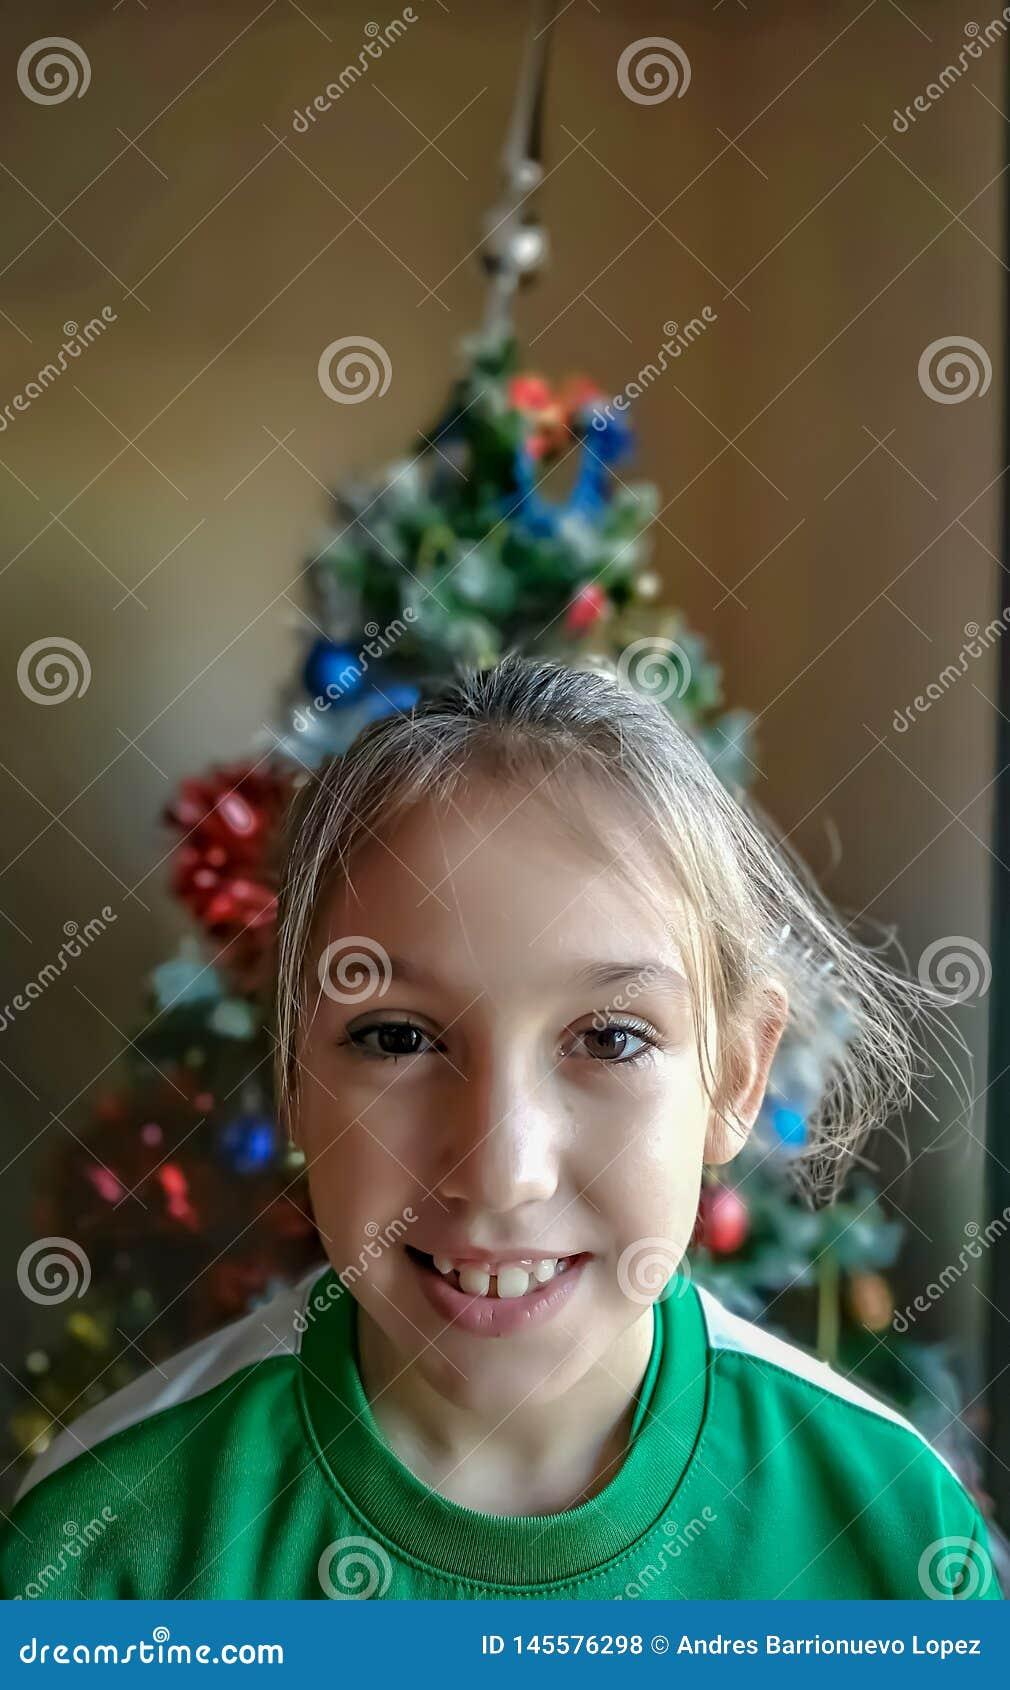 Sonrisa y muchacha feliz